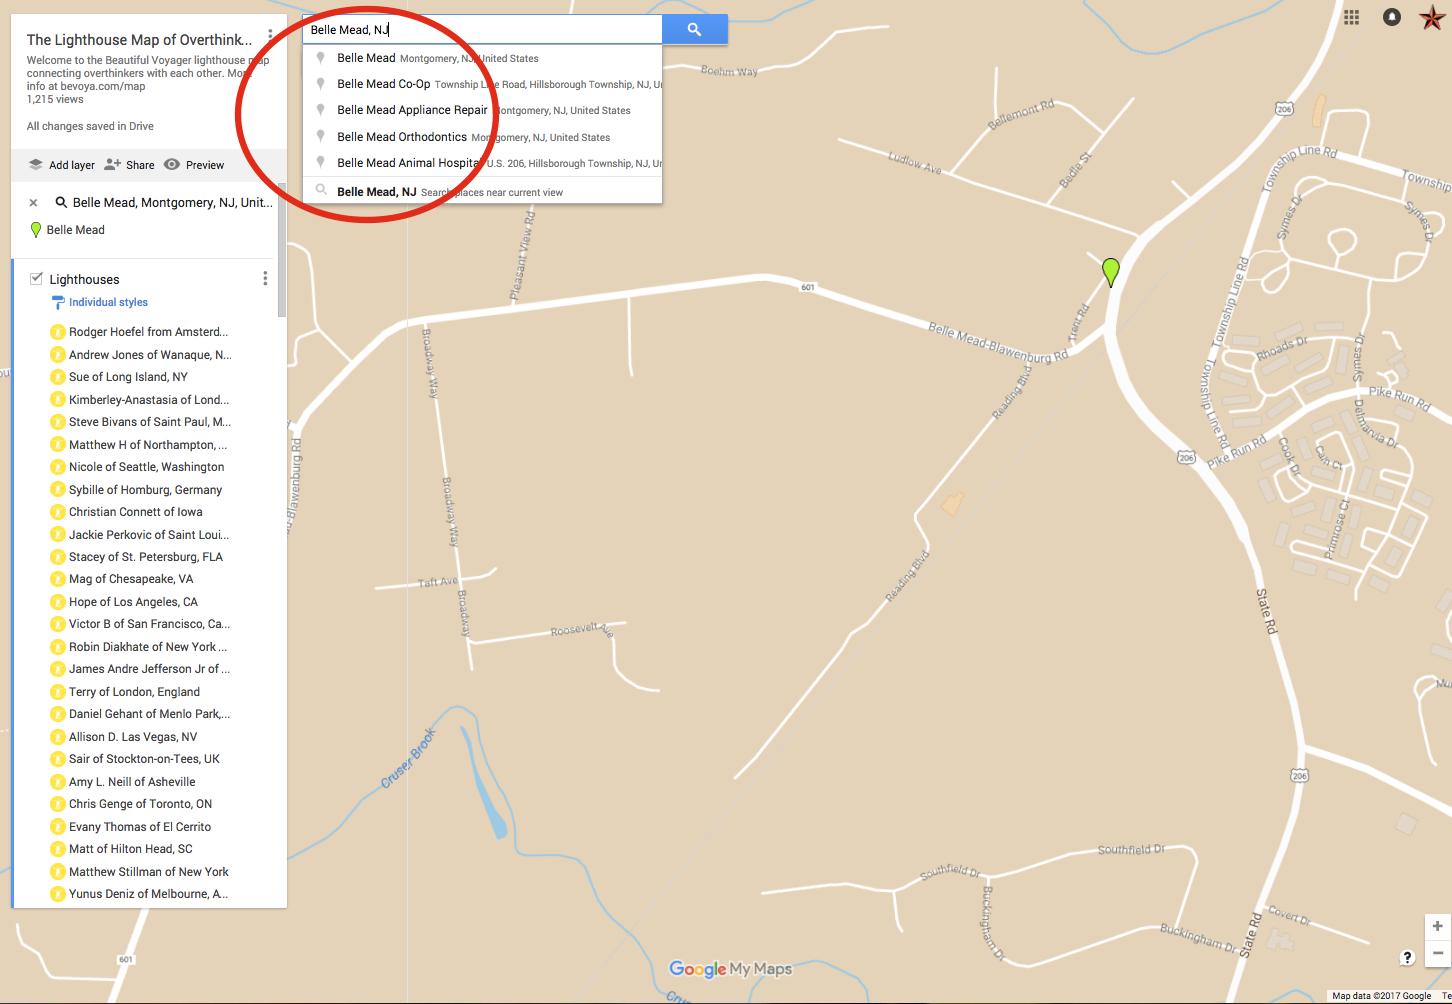 google my maps